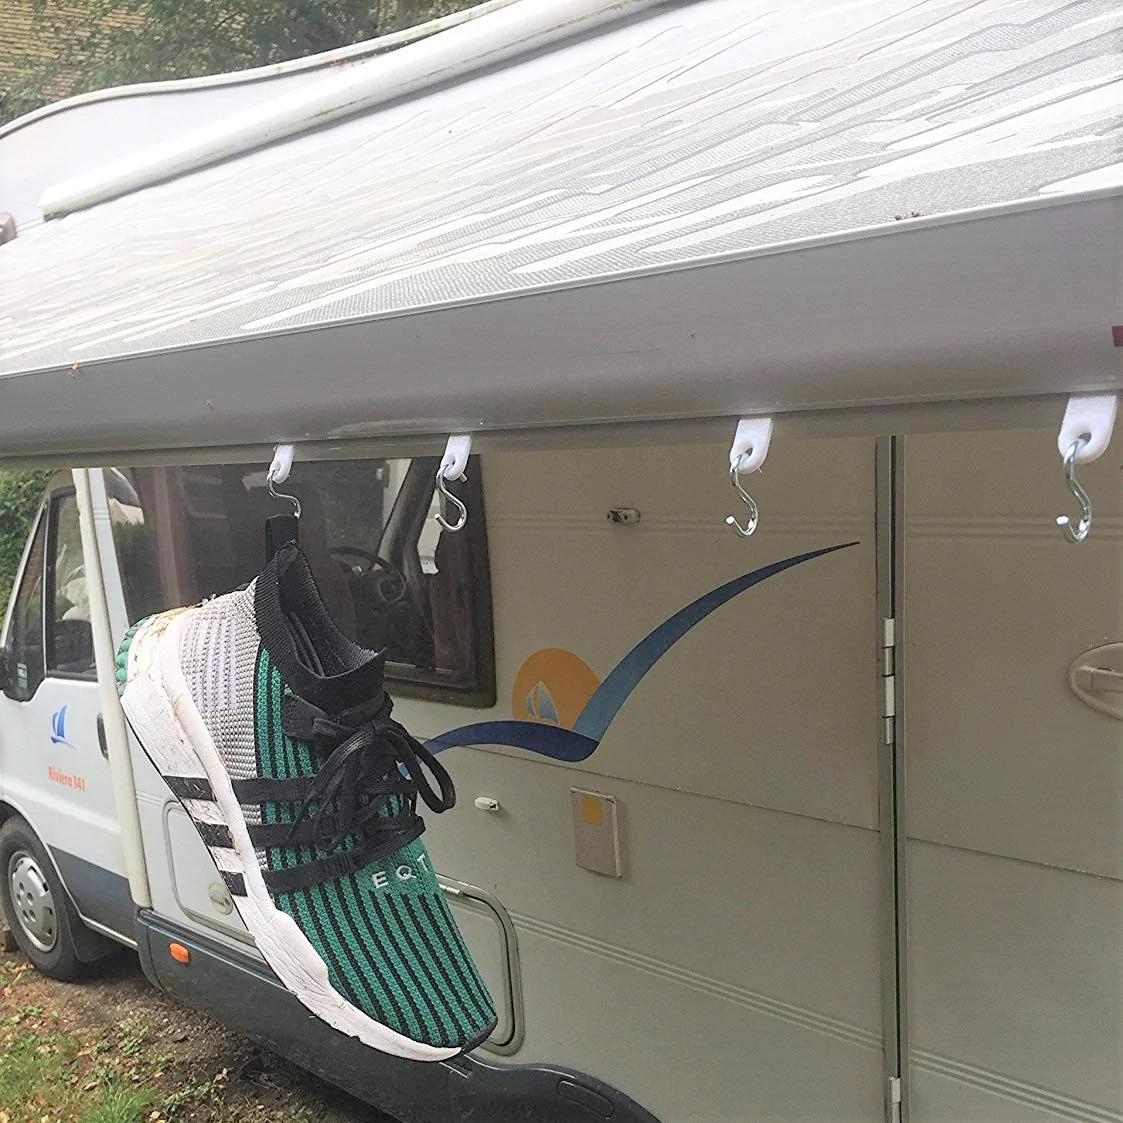 TOTMOX 6 PCS Awning Hook Ring Clothes hanger Clip String Hooks For RV Caravan Motorhome Camper